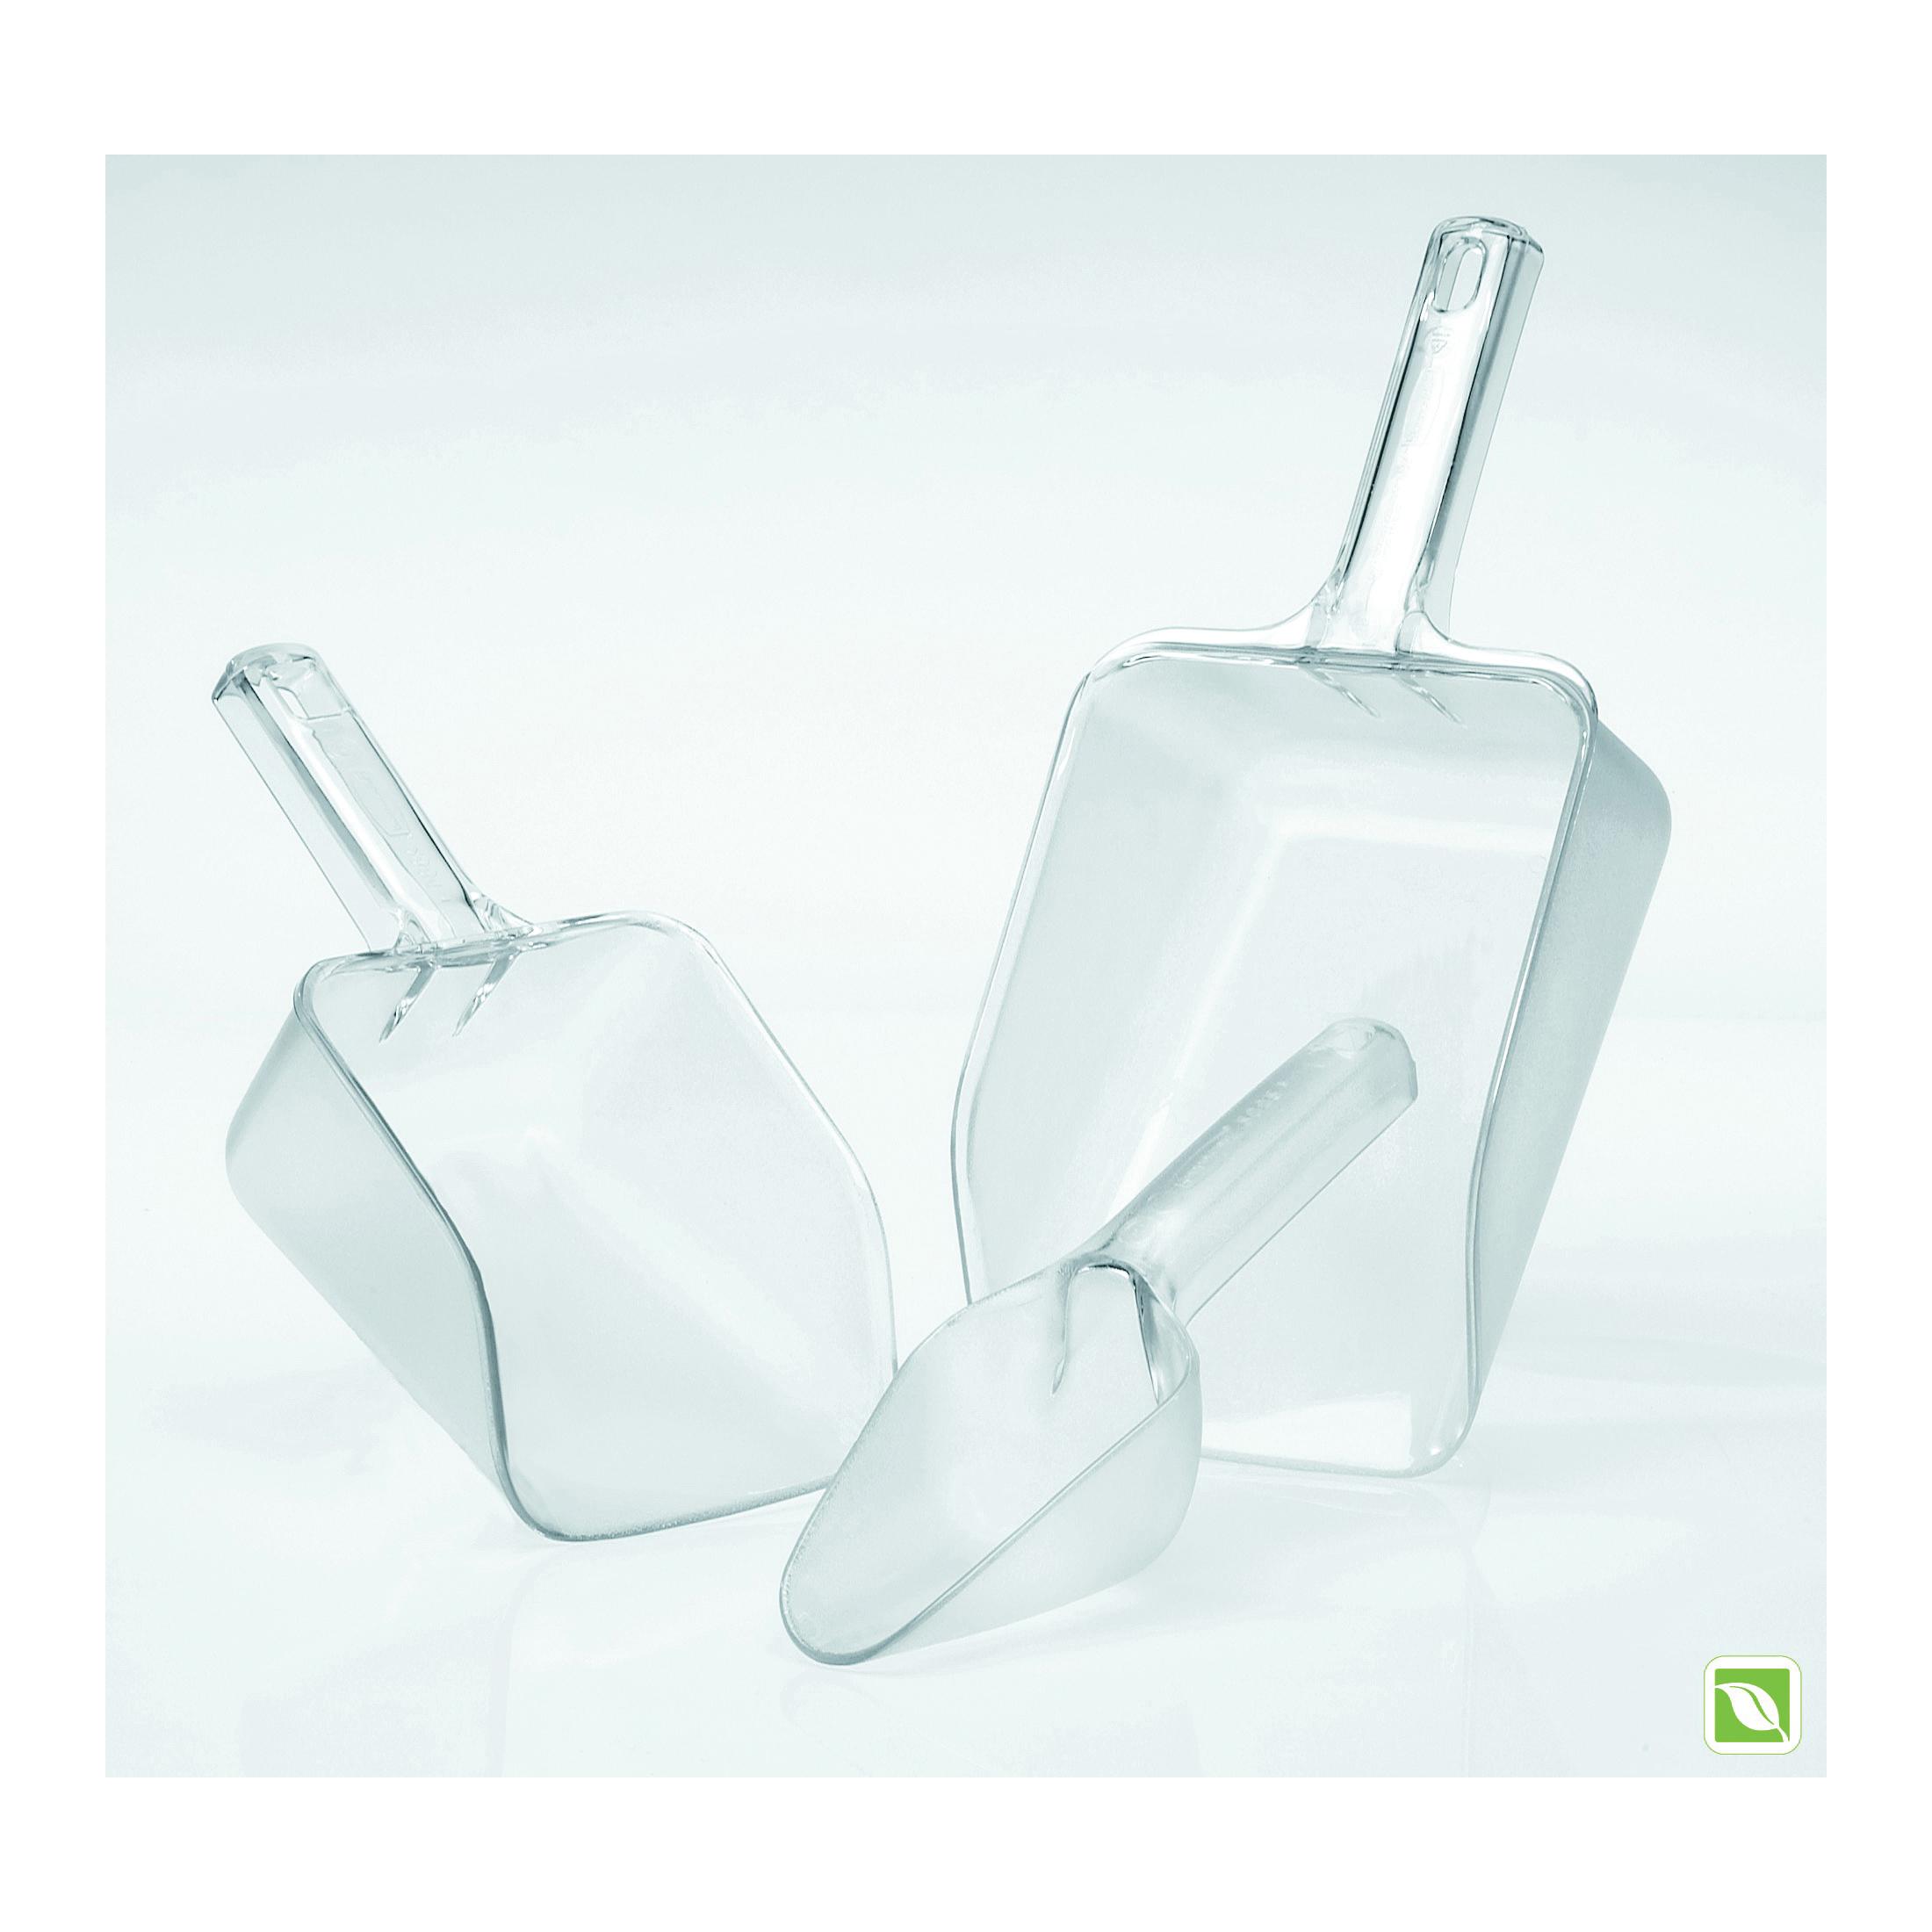 Rubbermaid® FG288400CLR 2884 Bouncer® Multi-Purpose Utility Scoop, 32 oz, 3-3/4 in L Handle, Corrugated Plastic/Polycarbonate